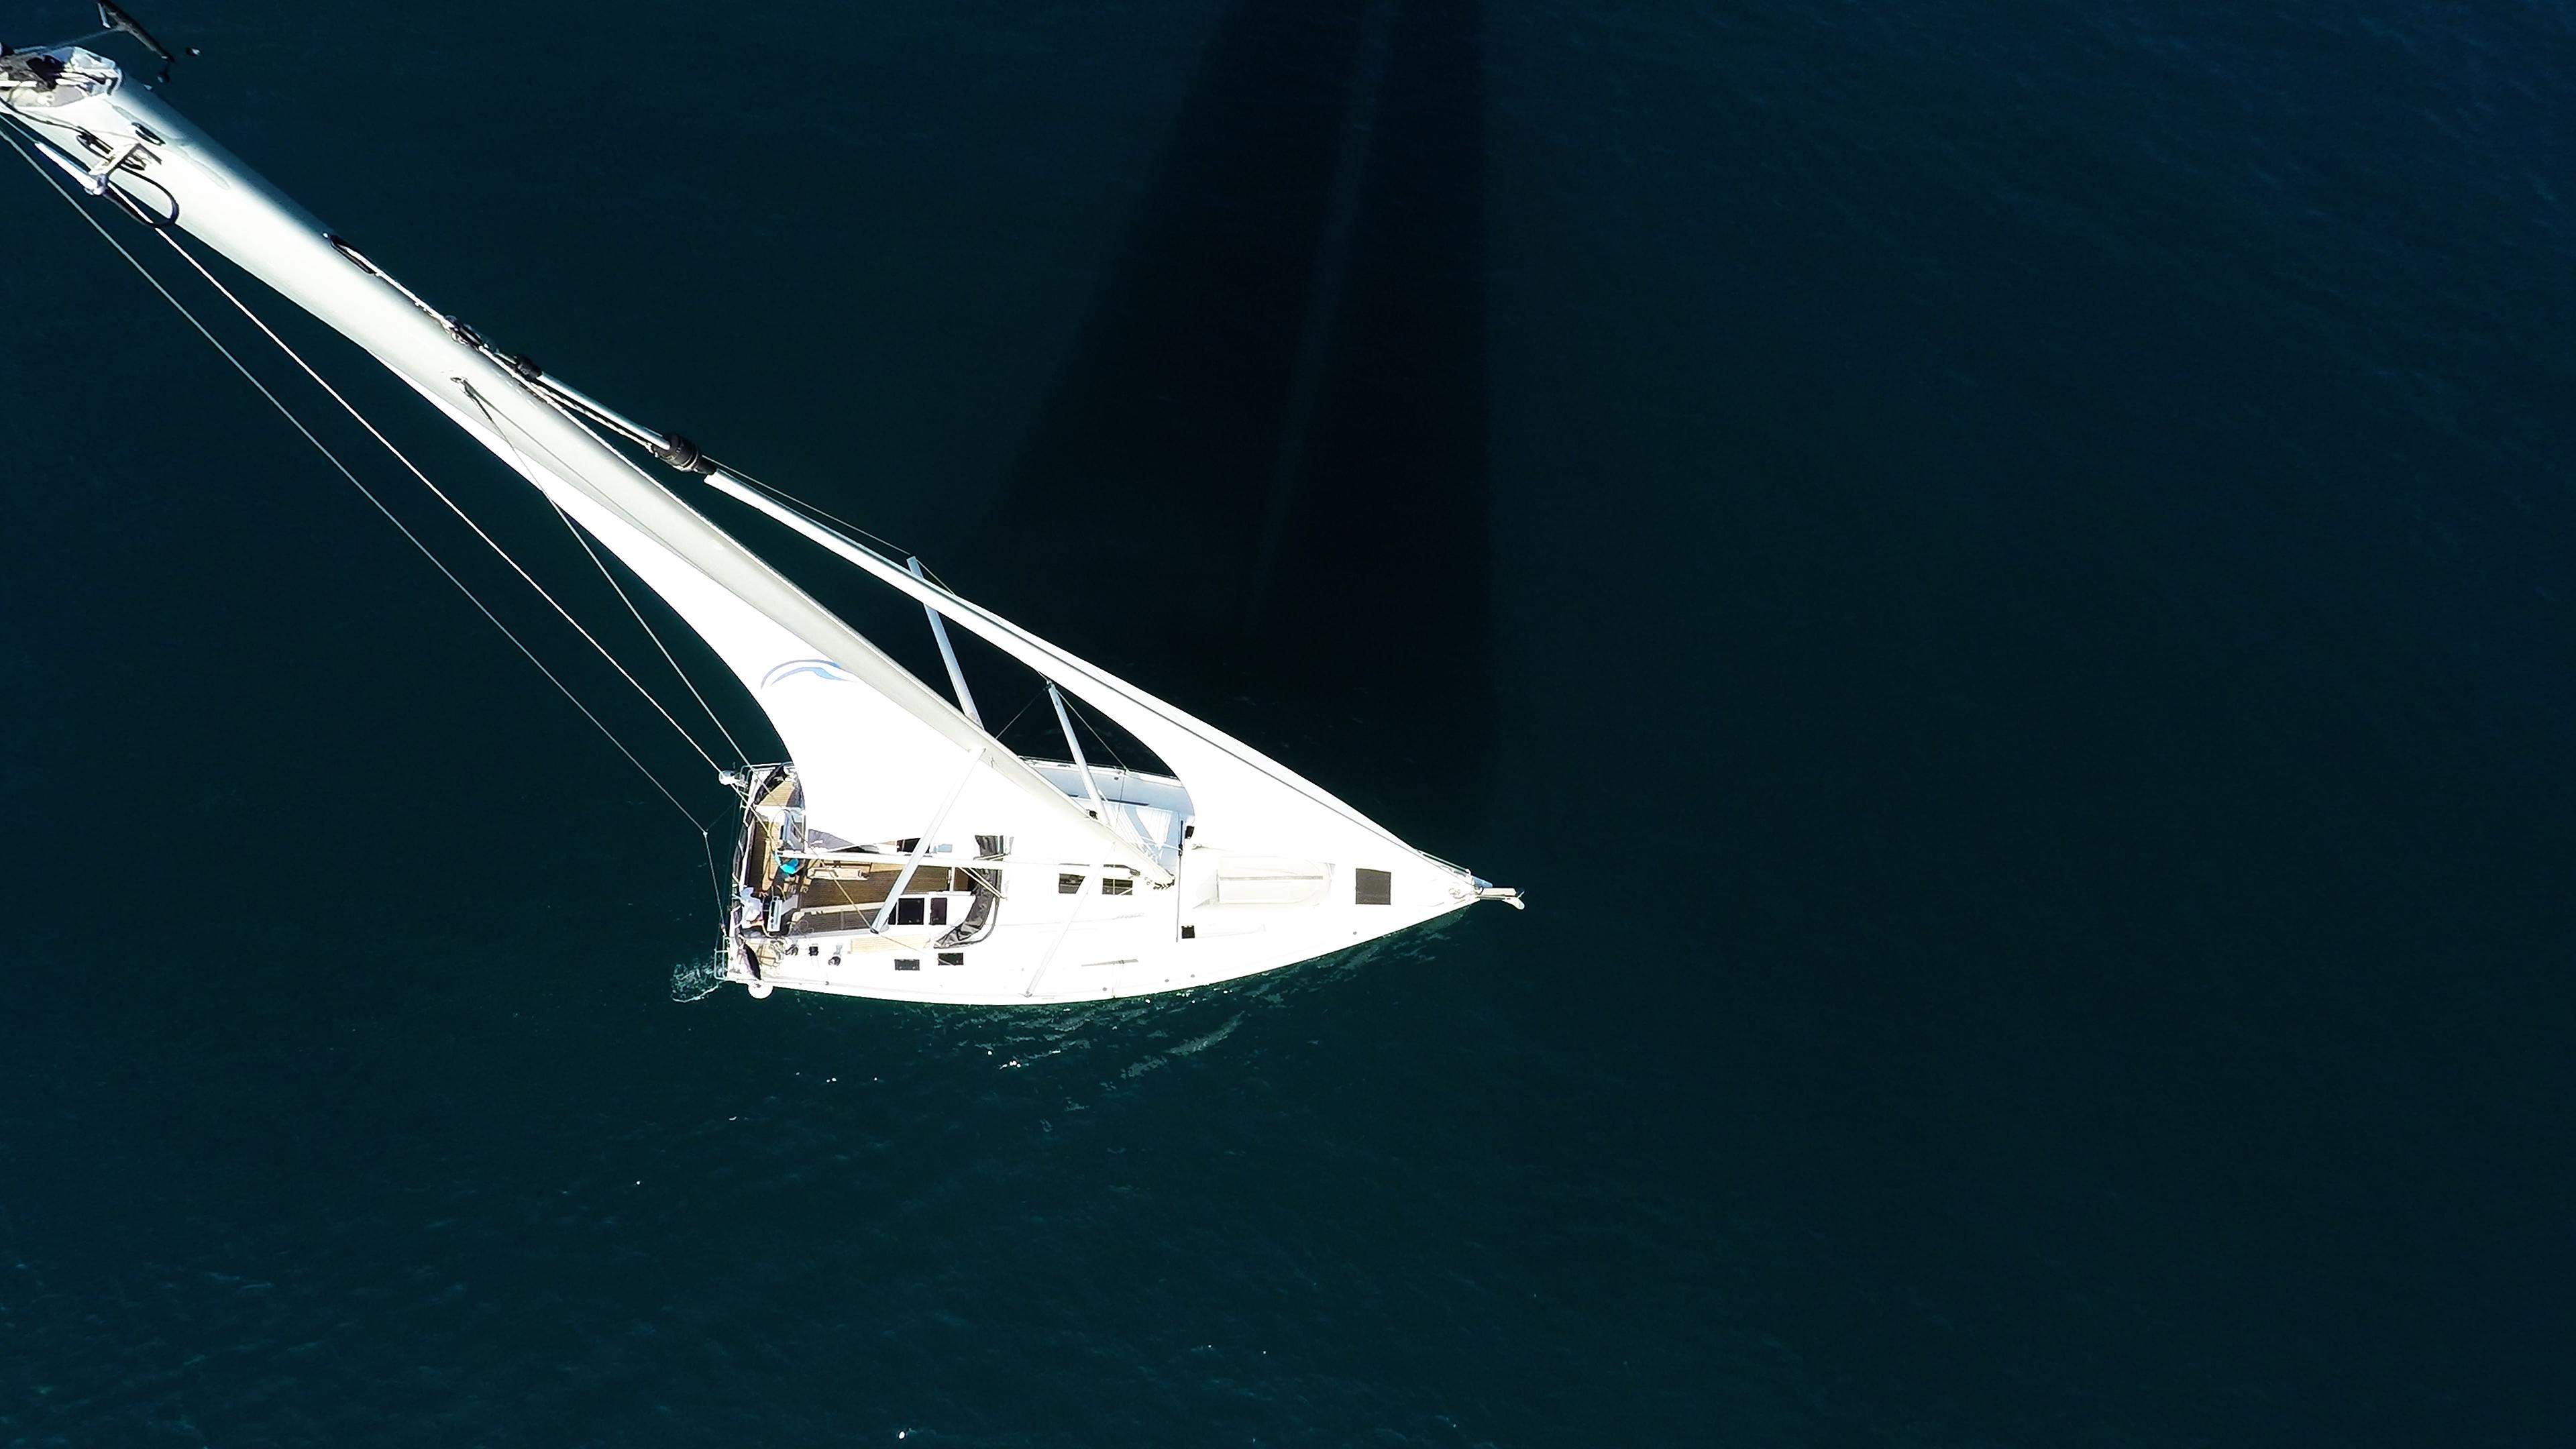 sailing yacht top mast rigging sails sailing yacht sea blue